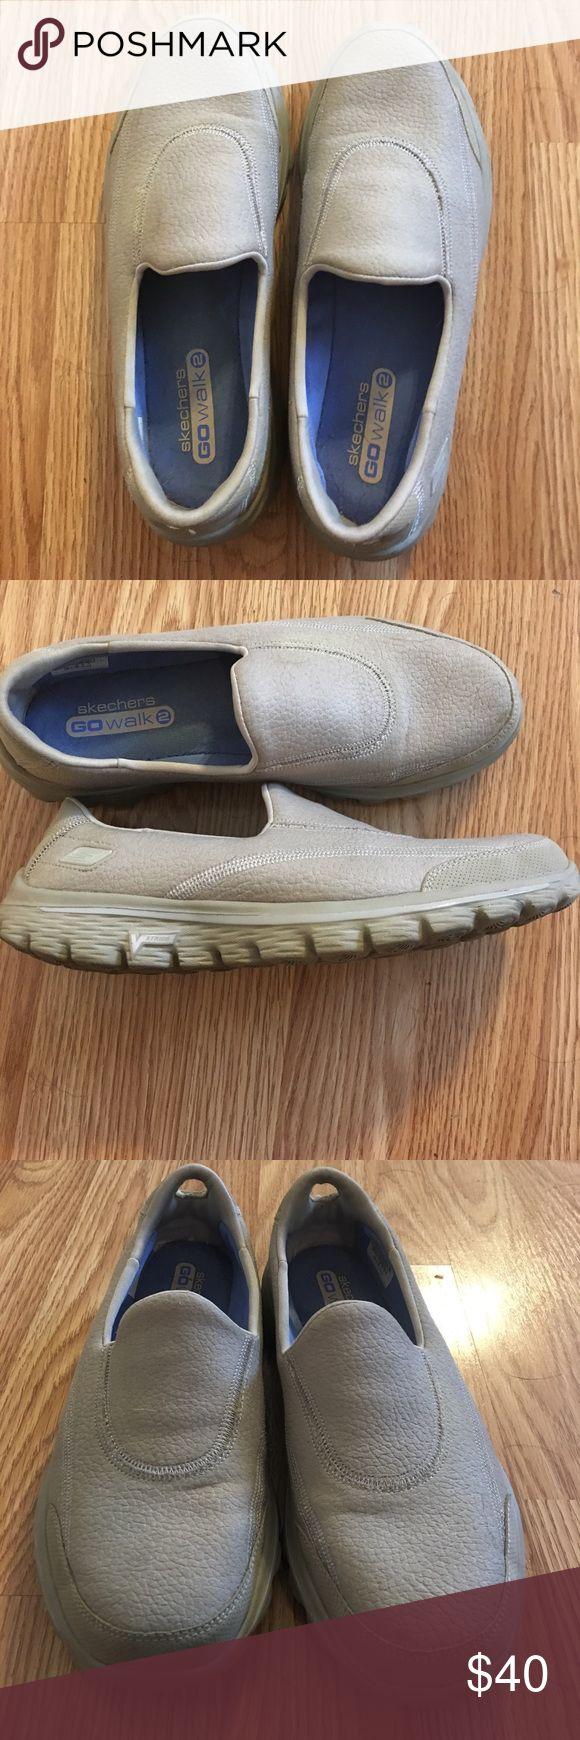 Skechers GOwalk2 slip on shoes size 7.5 Skechers GOwalk2 memory foam slip on tan shoes size 7.5. Worn only a few times, incredibly comfy like new! Skechers Shoes